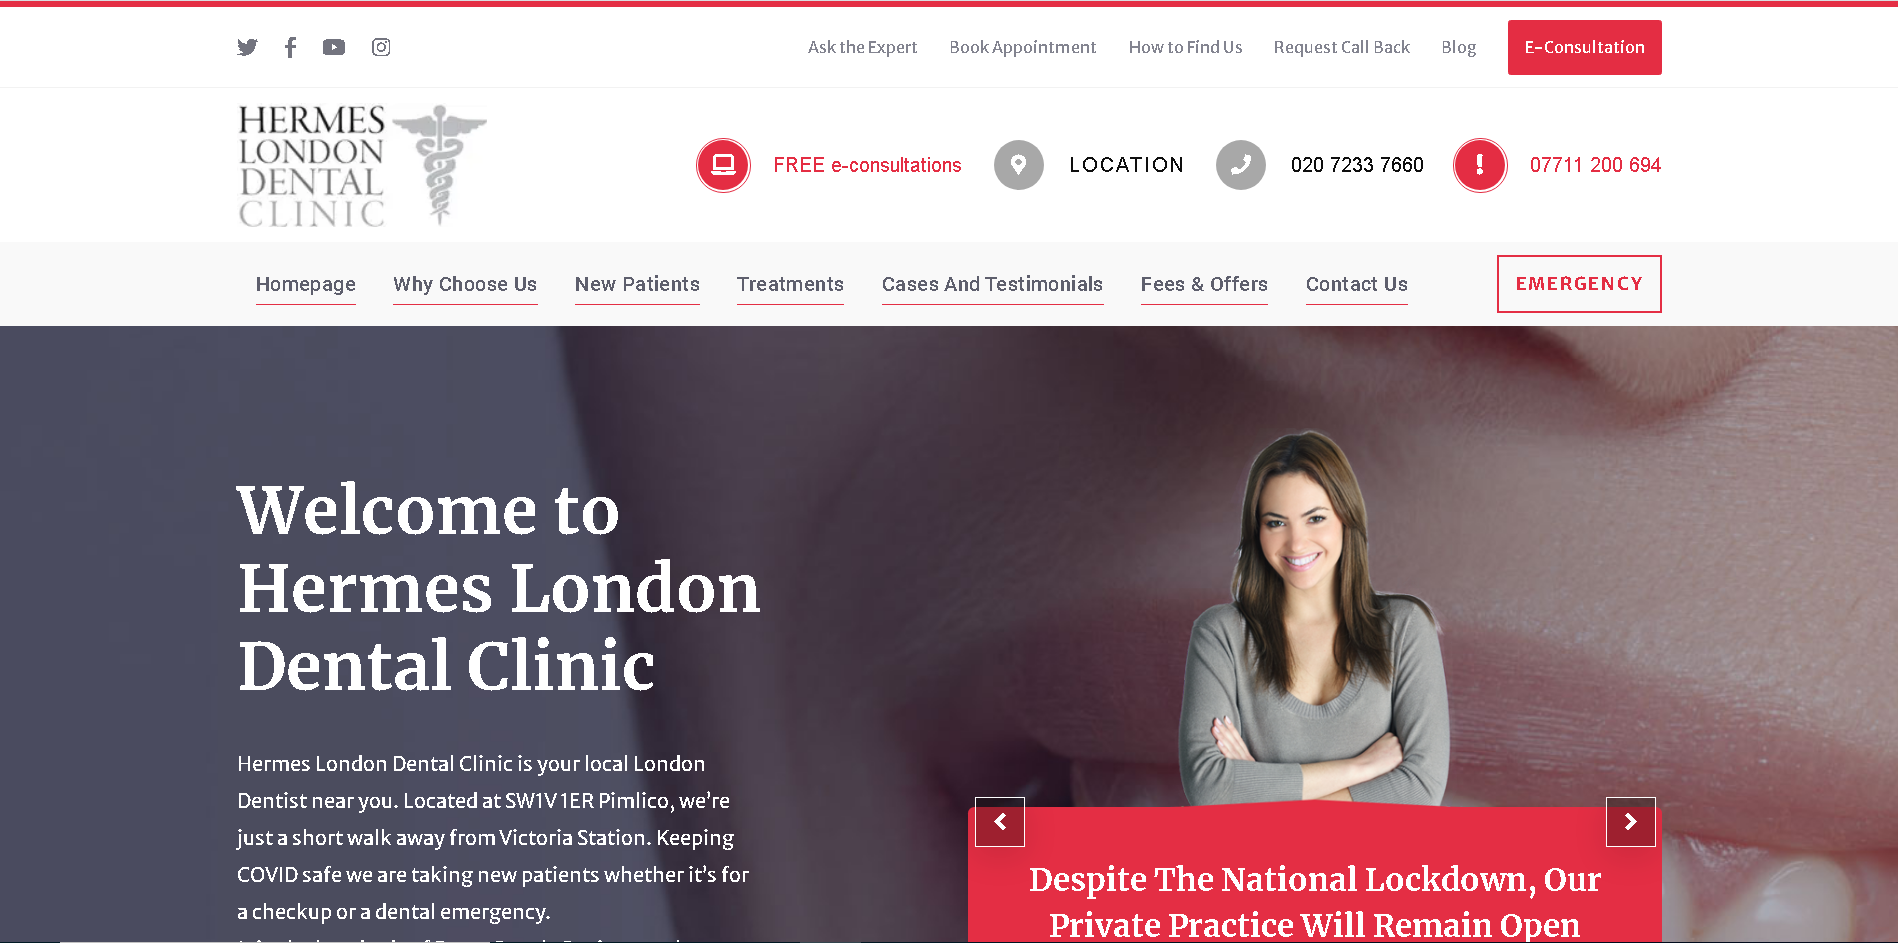 Homes London Dental Clinic